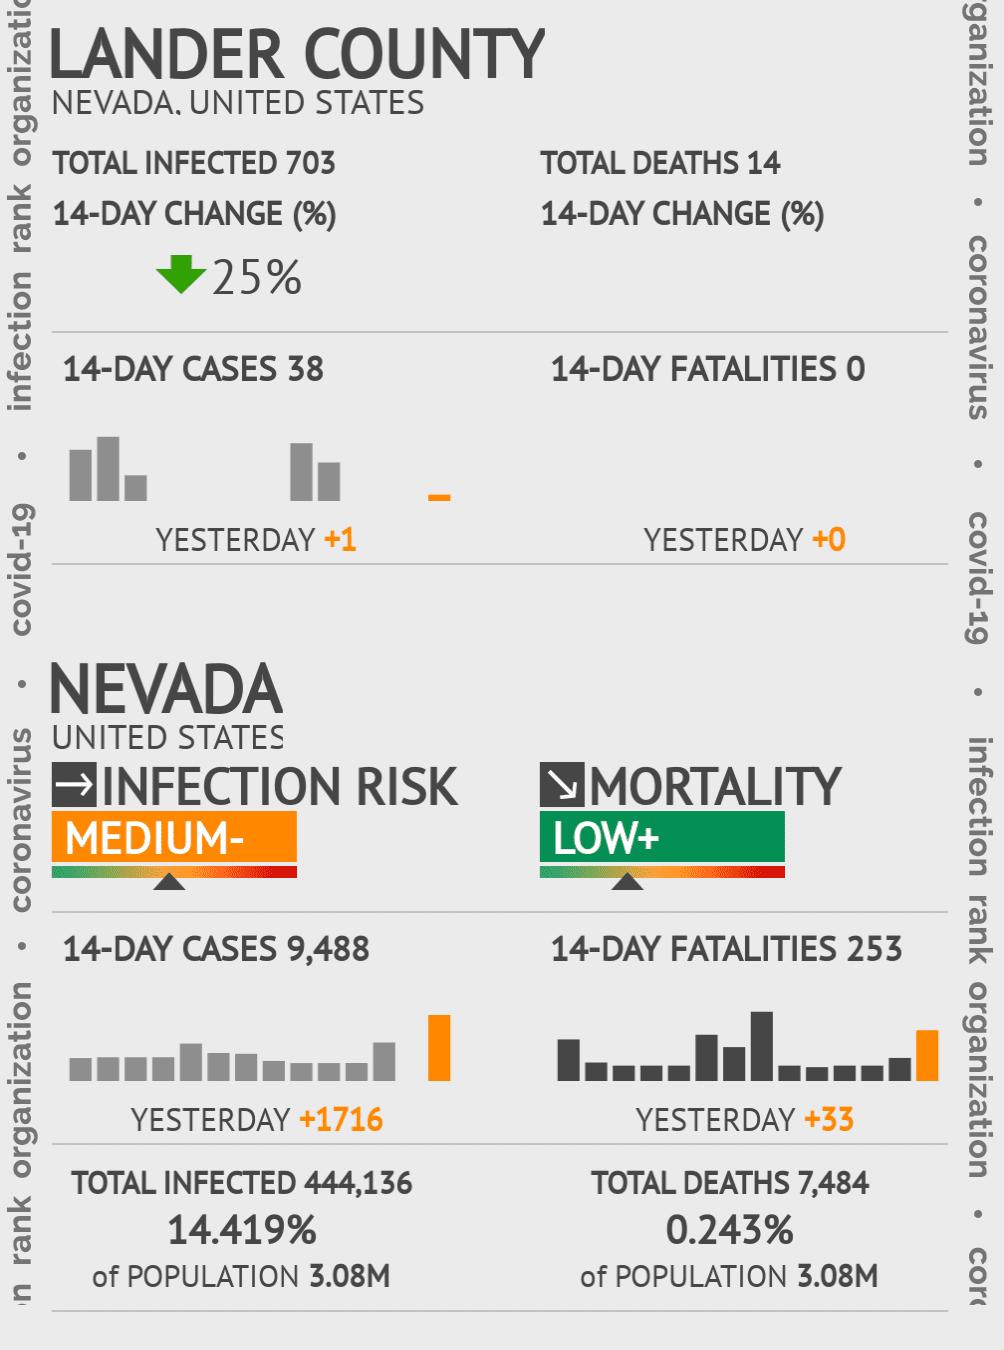 Lander County Coronavirus Covid-19 Risk of Infection on July 24, 2021